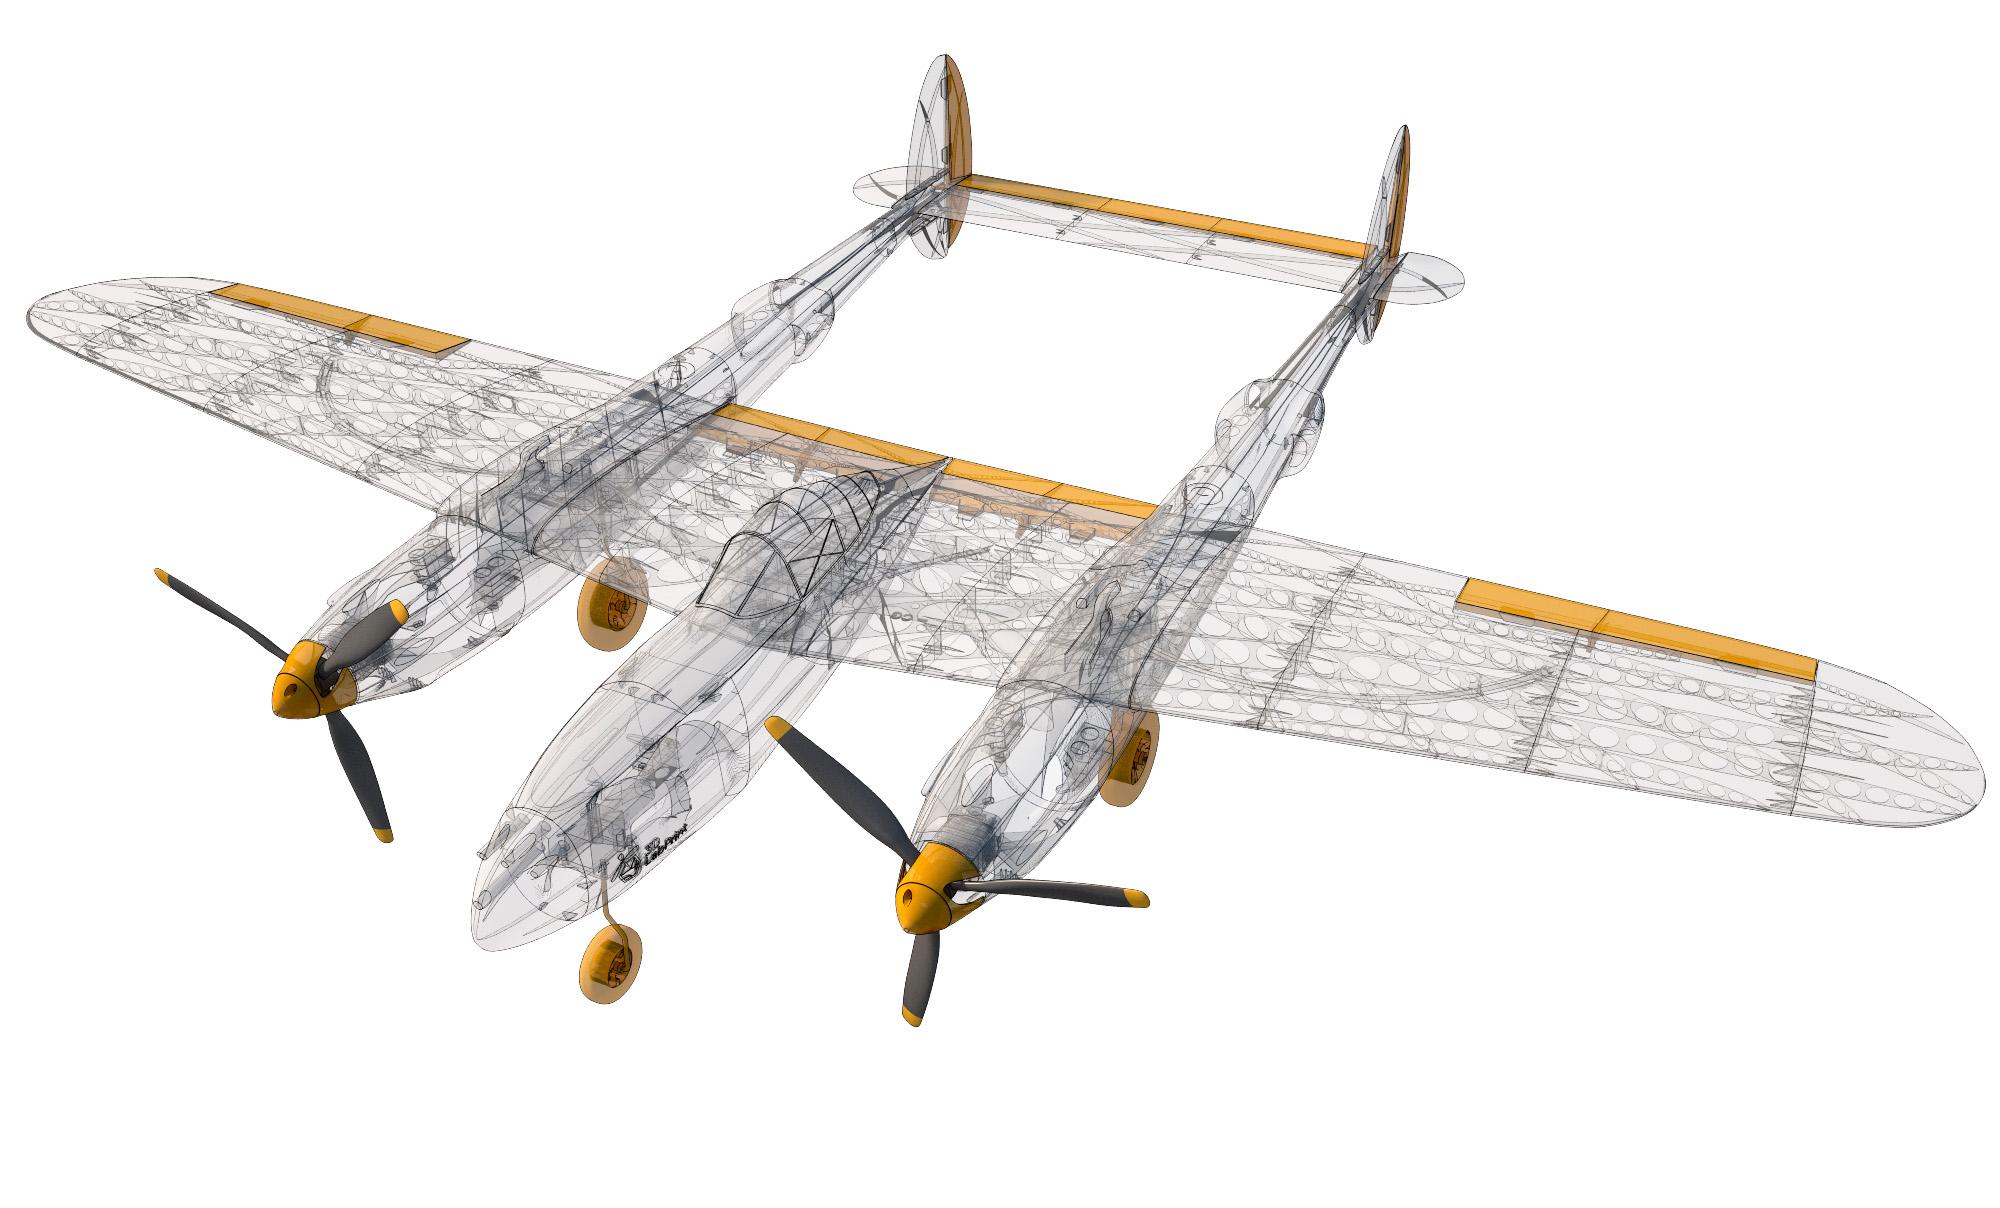 Lockheed P-38 Lightning – 3DLabPrint